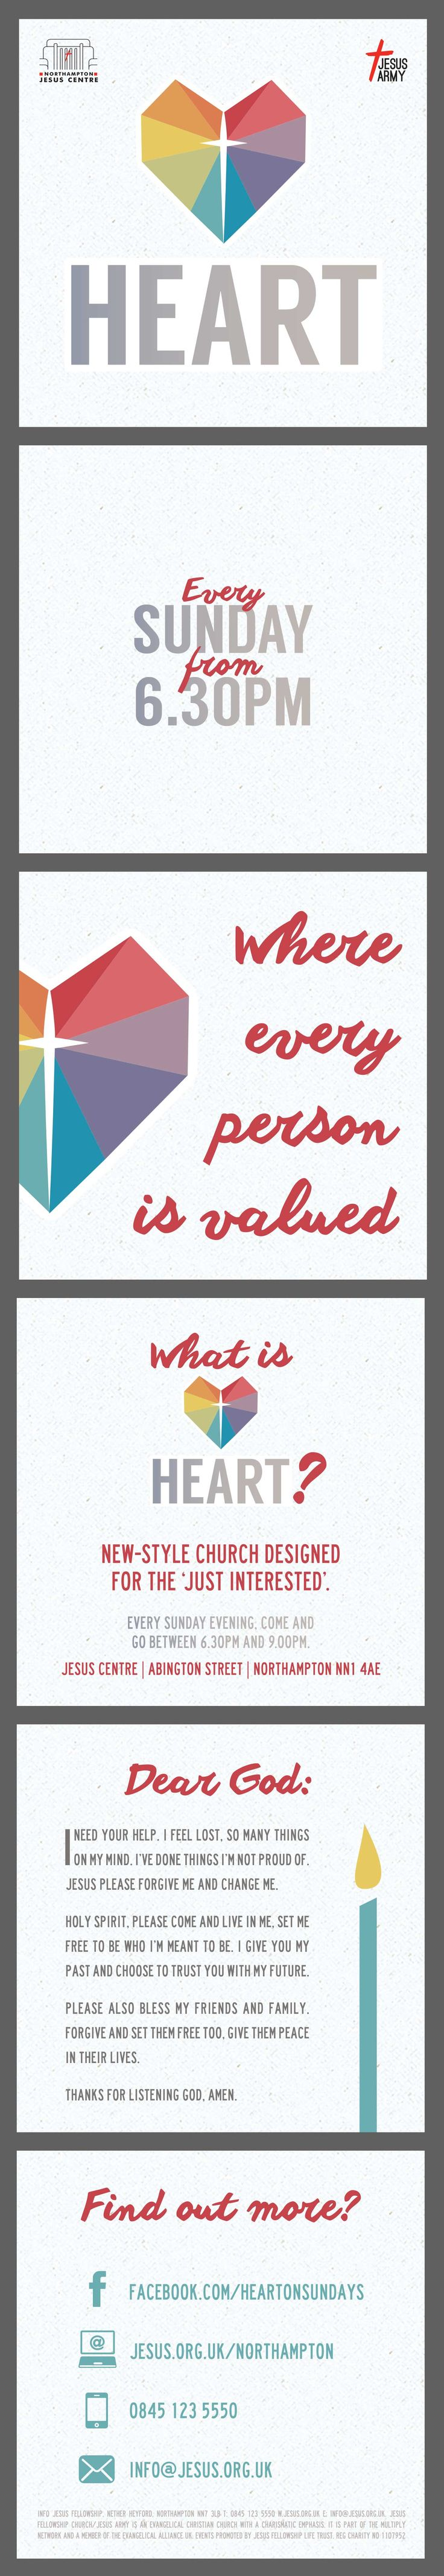 Best free poster design software - Heart Card Sunday Church Church Invite Prayer Card